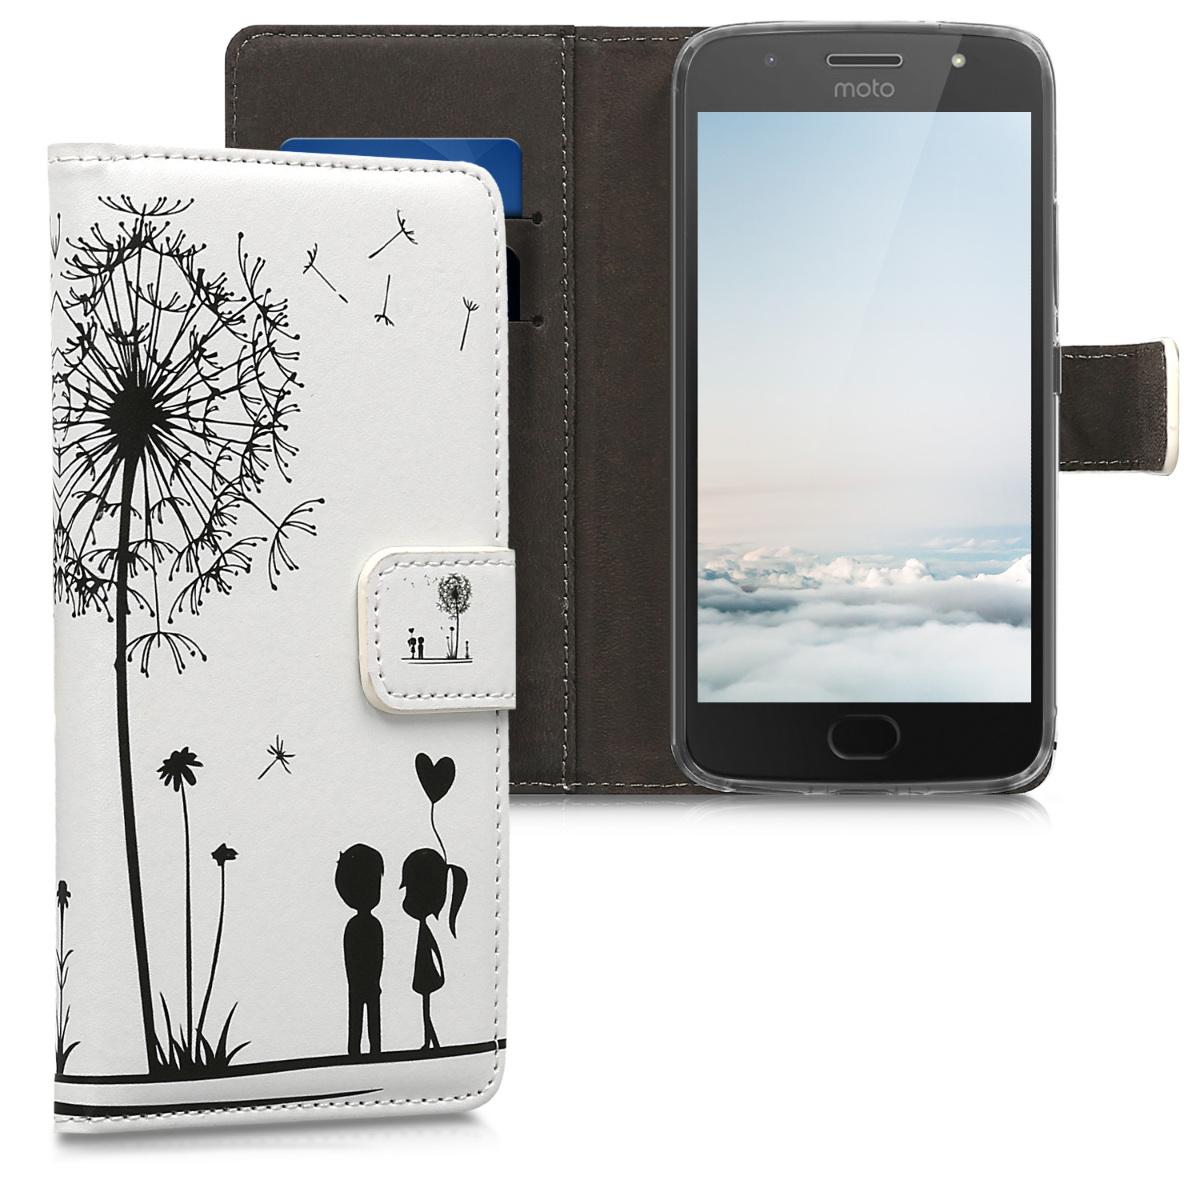 Kožené pouzdro | obal pro Motorola Moto G5S - Pampeliška lásky černá / bílá